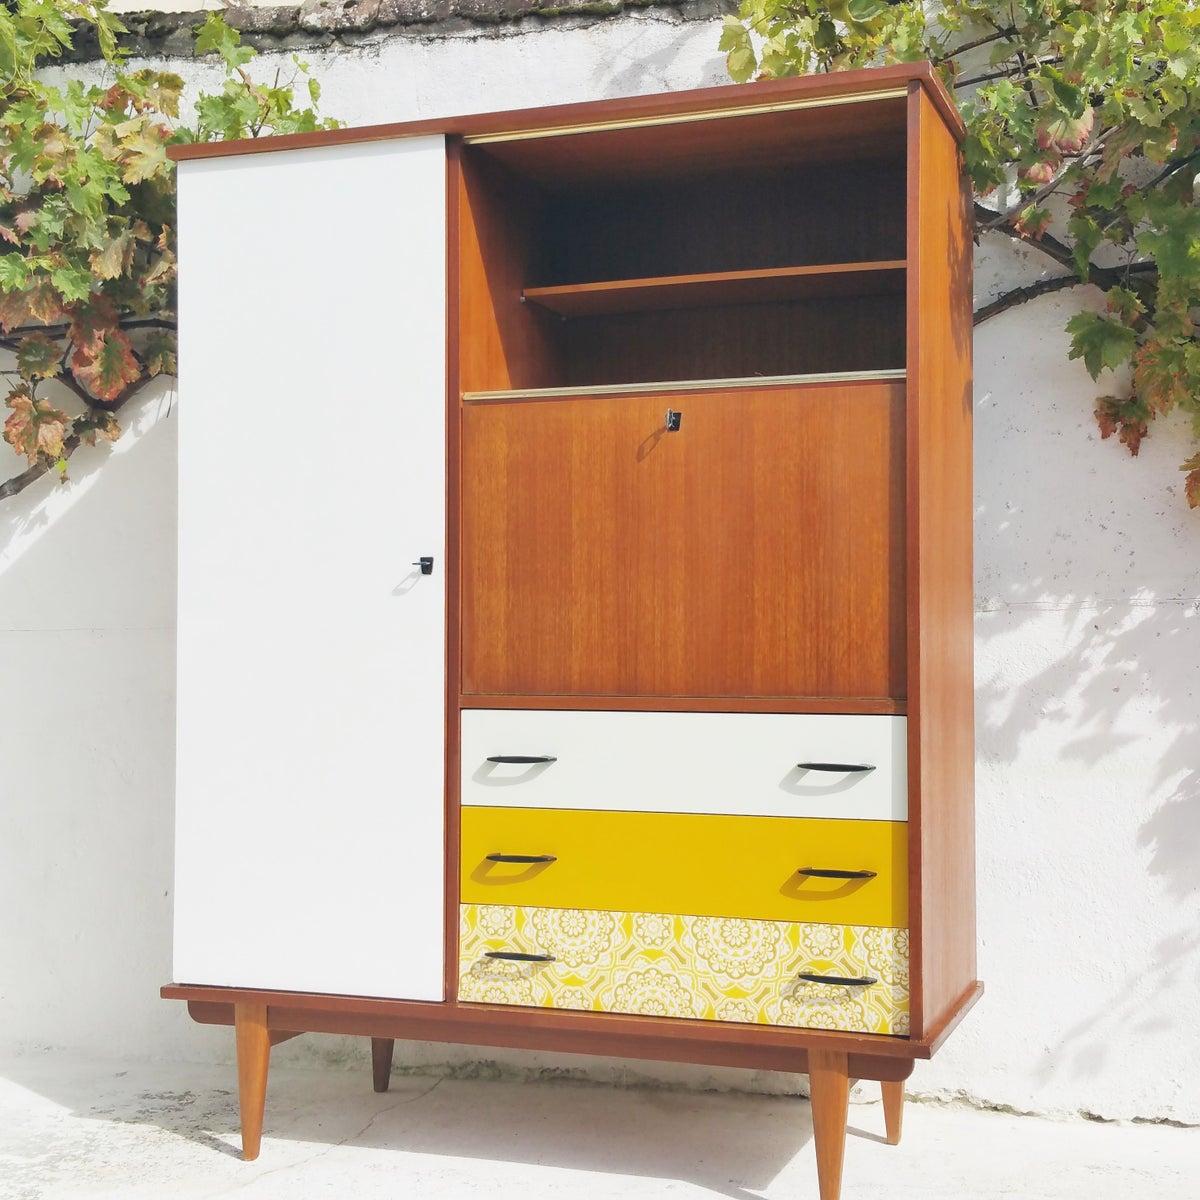 armoire secr taire penderie vintage fibresendeco vannerie artisanale mobilier vintage. Black Bedroom Furniture Sets. Home Design Ideas